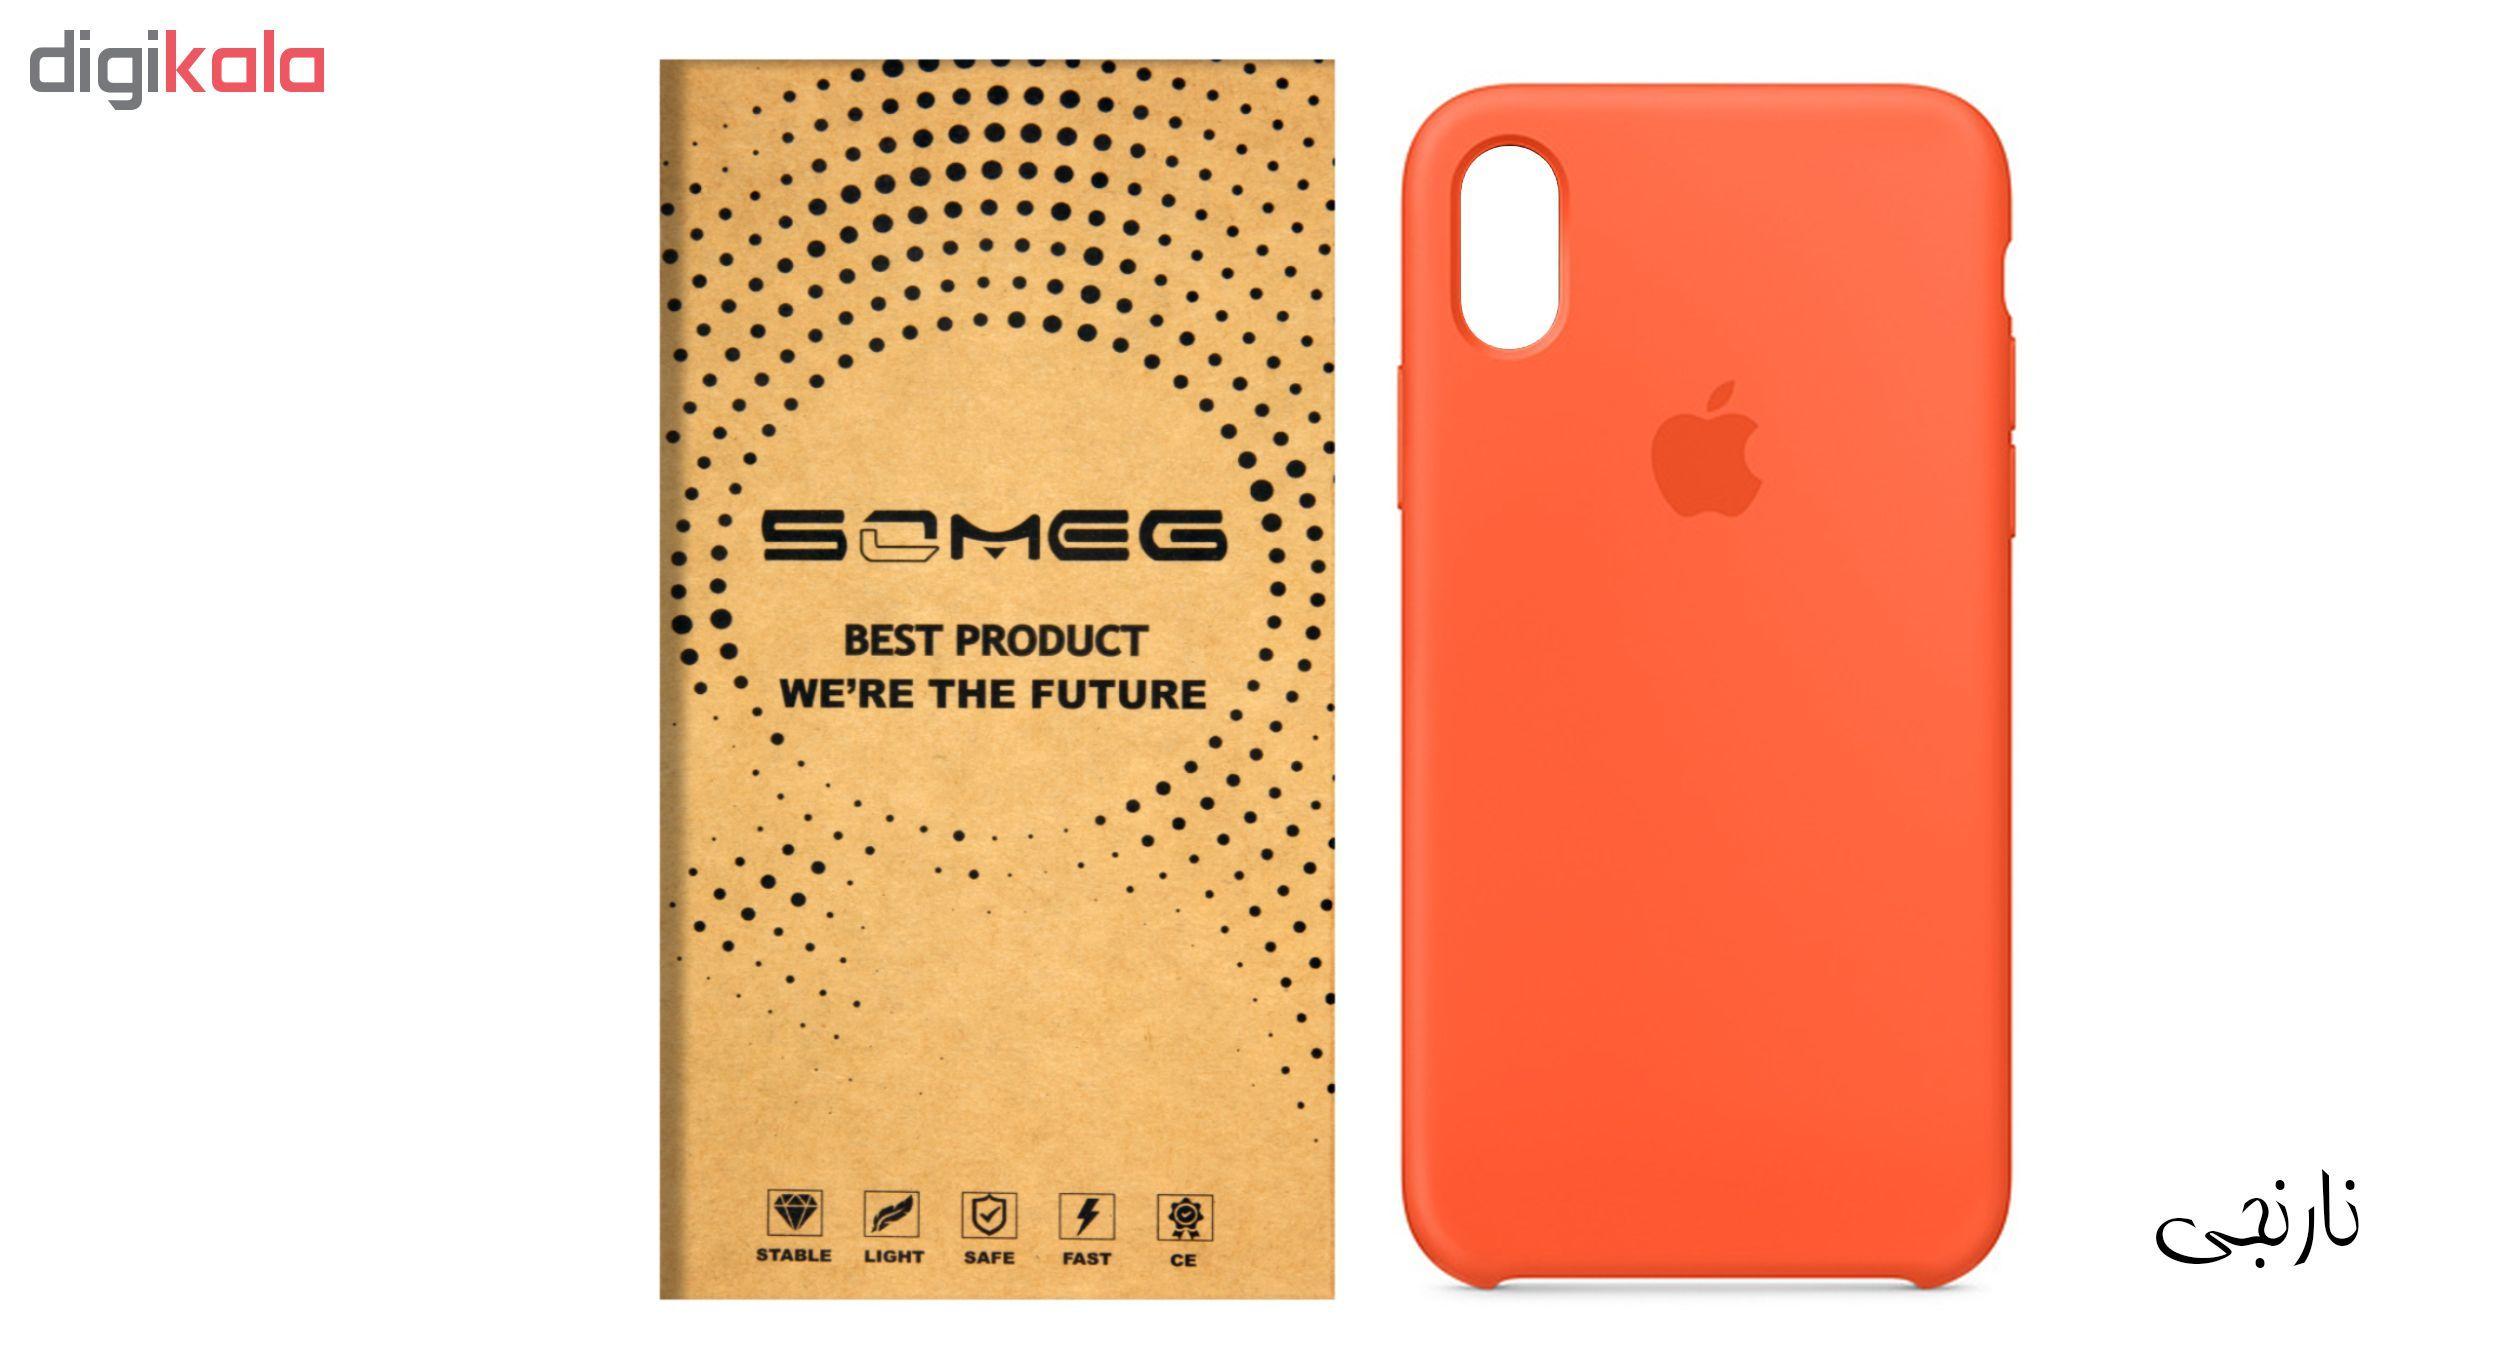 کاور سومگ مدل SIC مناسب برای گوشی موبایل اپل iPhone X  main 1 23